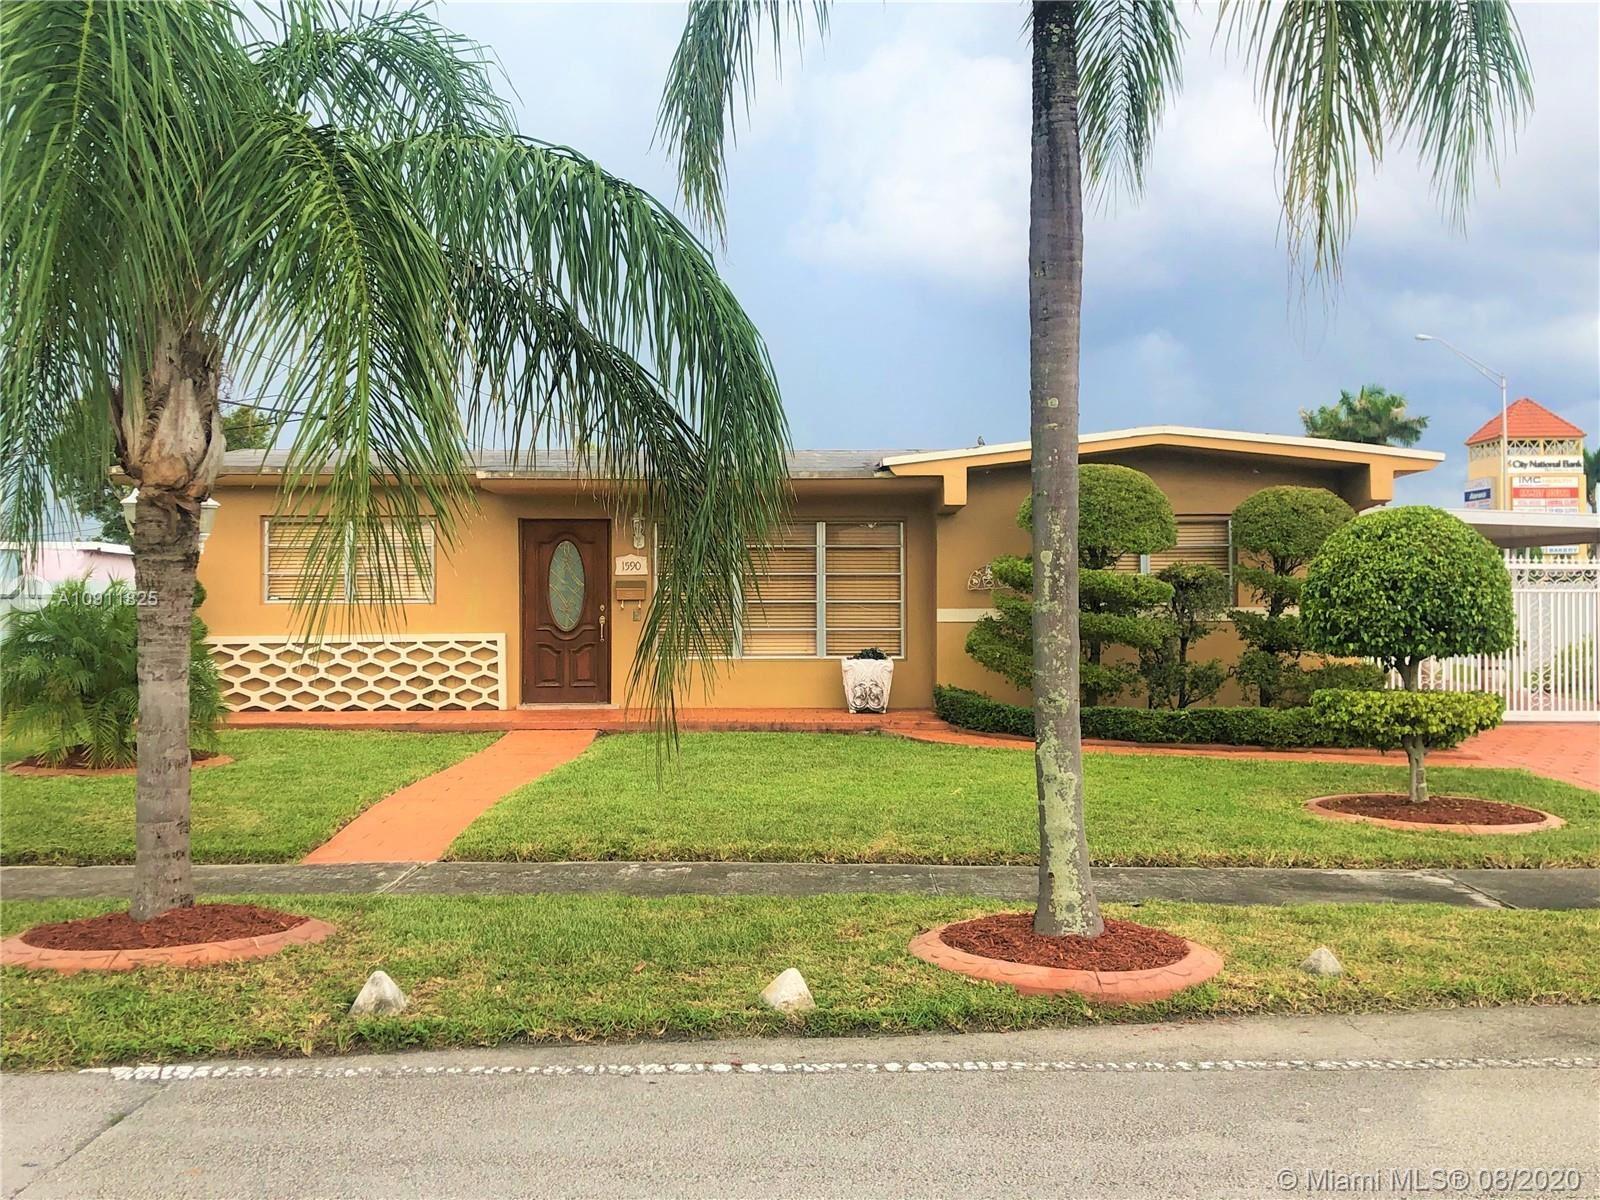 1590 W 55th St, Hialeah, FL 33012 - #: A10911825